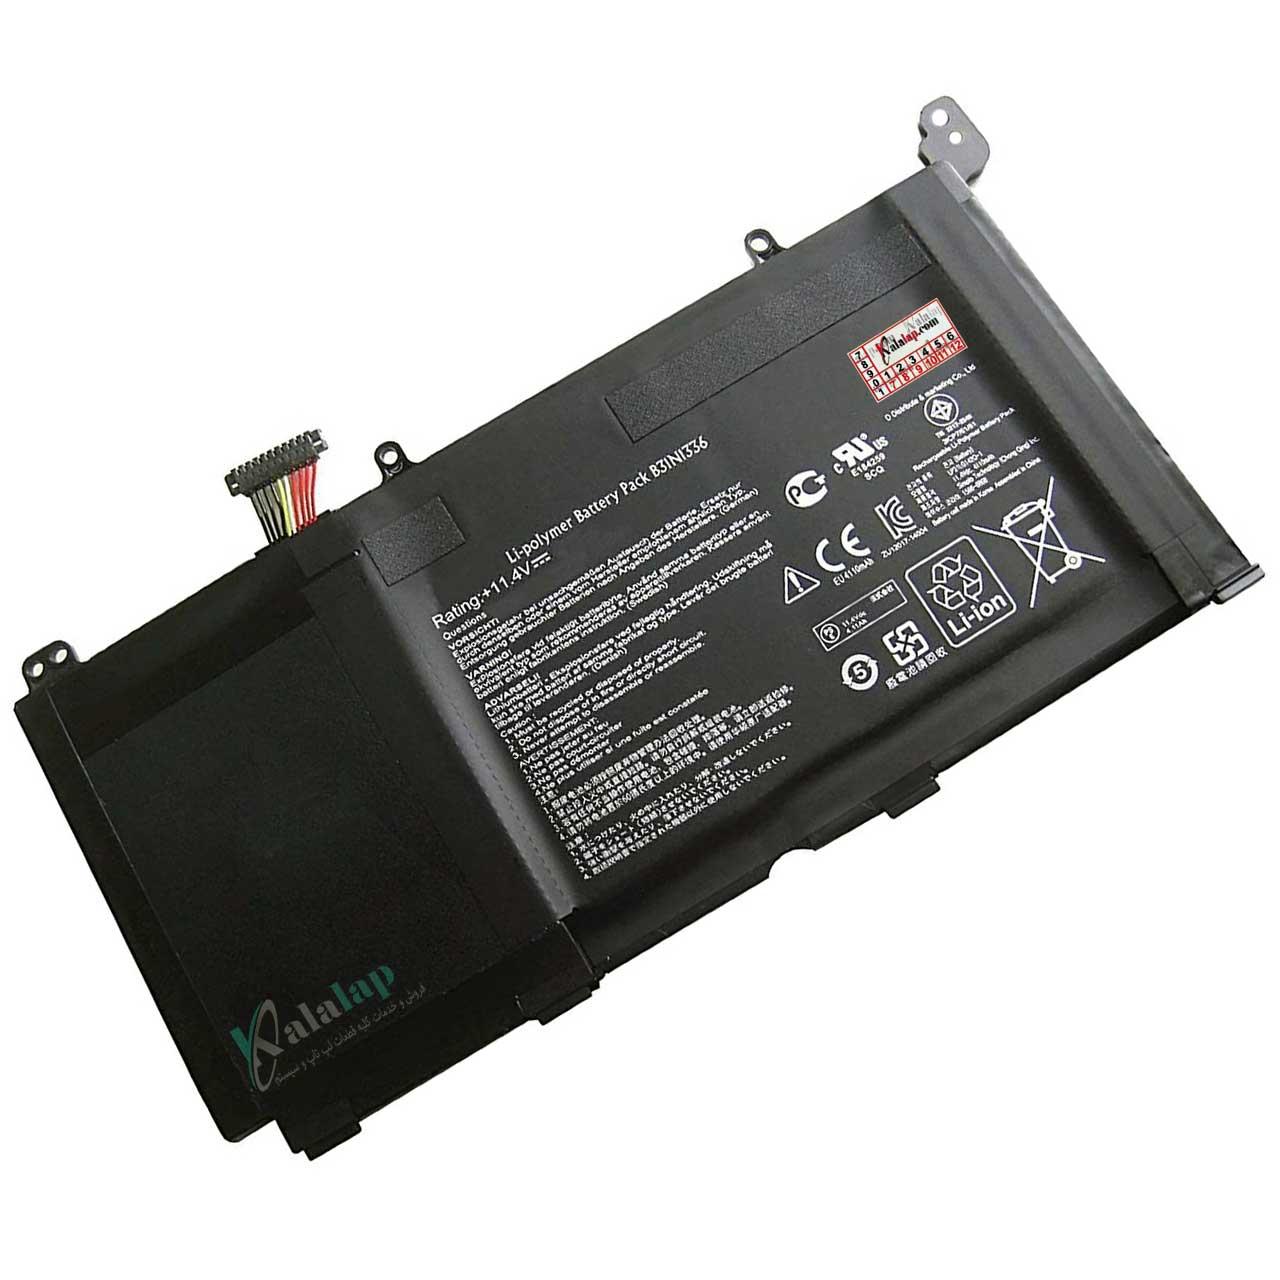 باتری لپ تاپ ایسوس S551 K551 V551 B31N1336